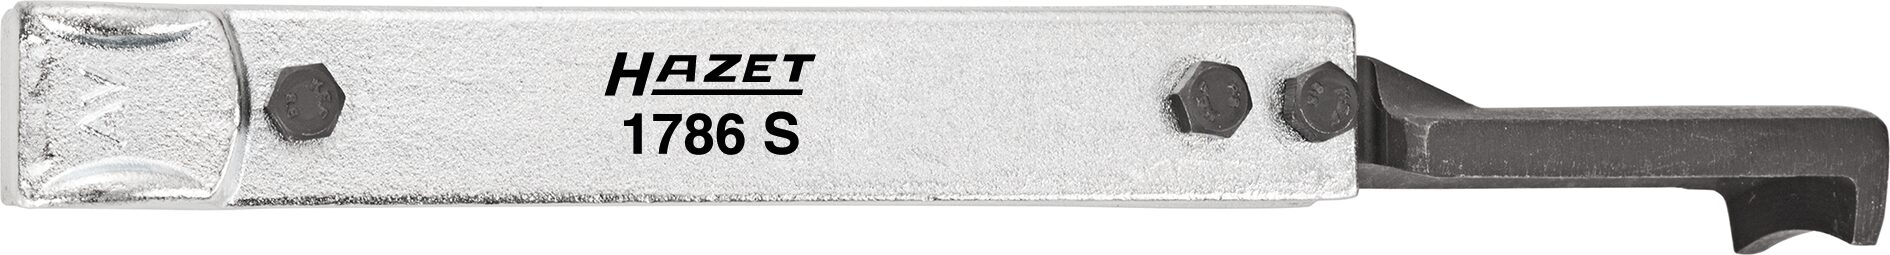 HAZET Abzughaken ∙ 100mm 1786S-100